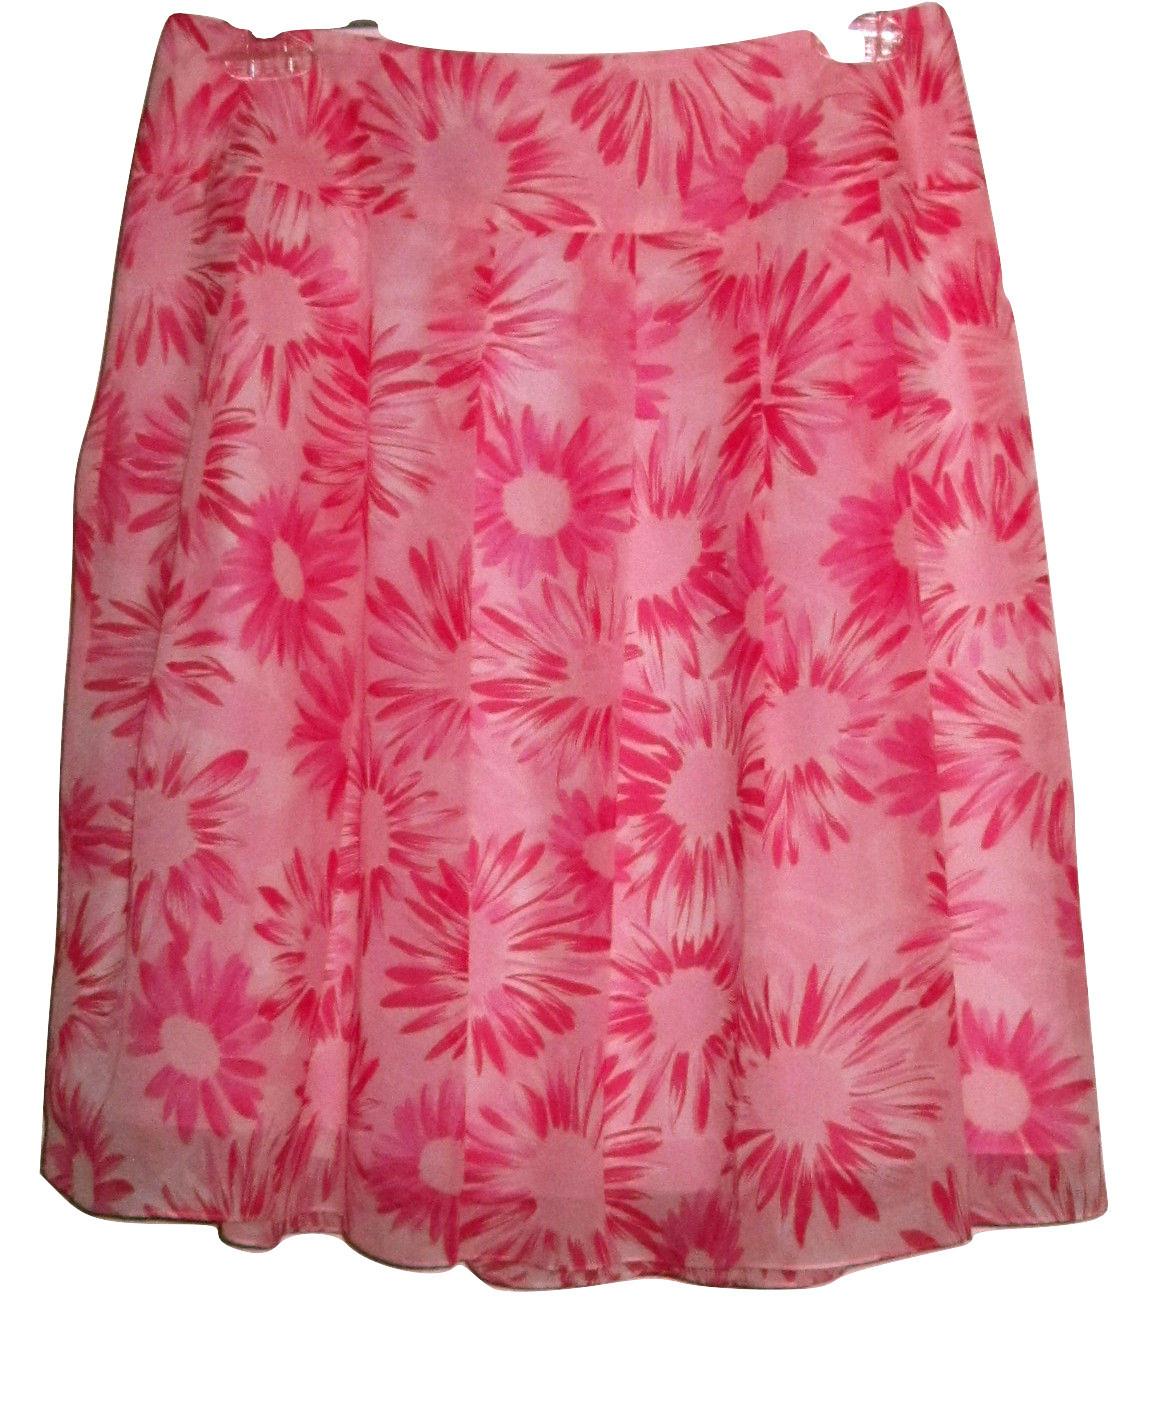 fb5b3b53d Bob Mackie Studio Beautiful Pink Floral and 50 similar items